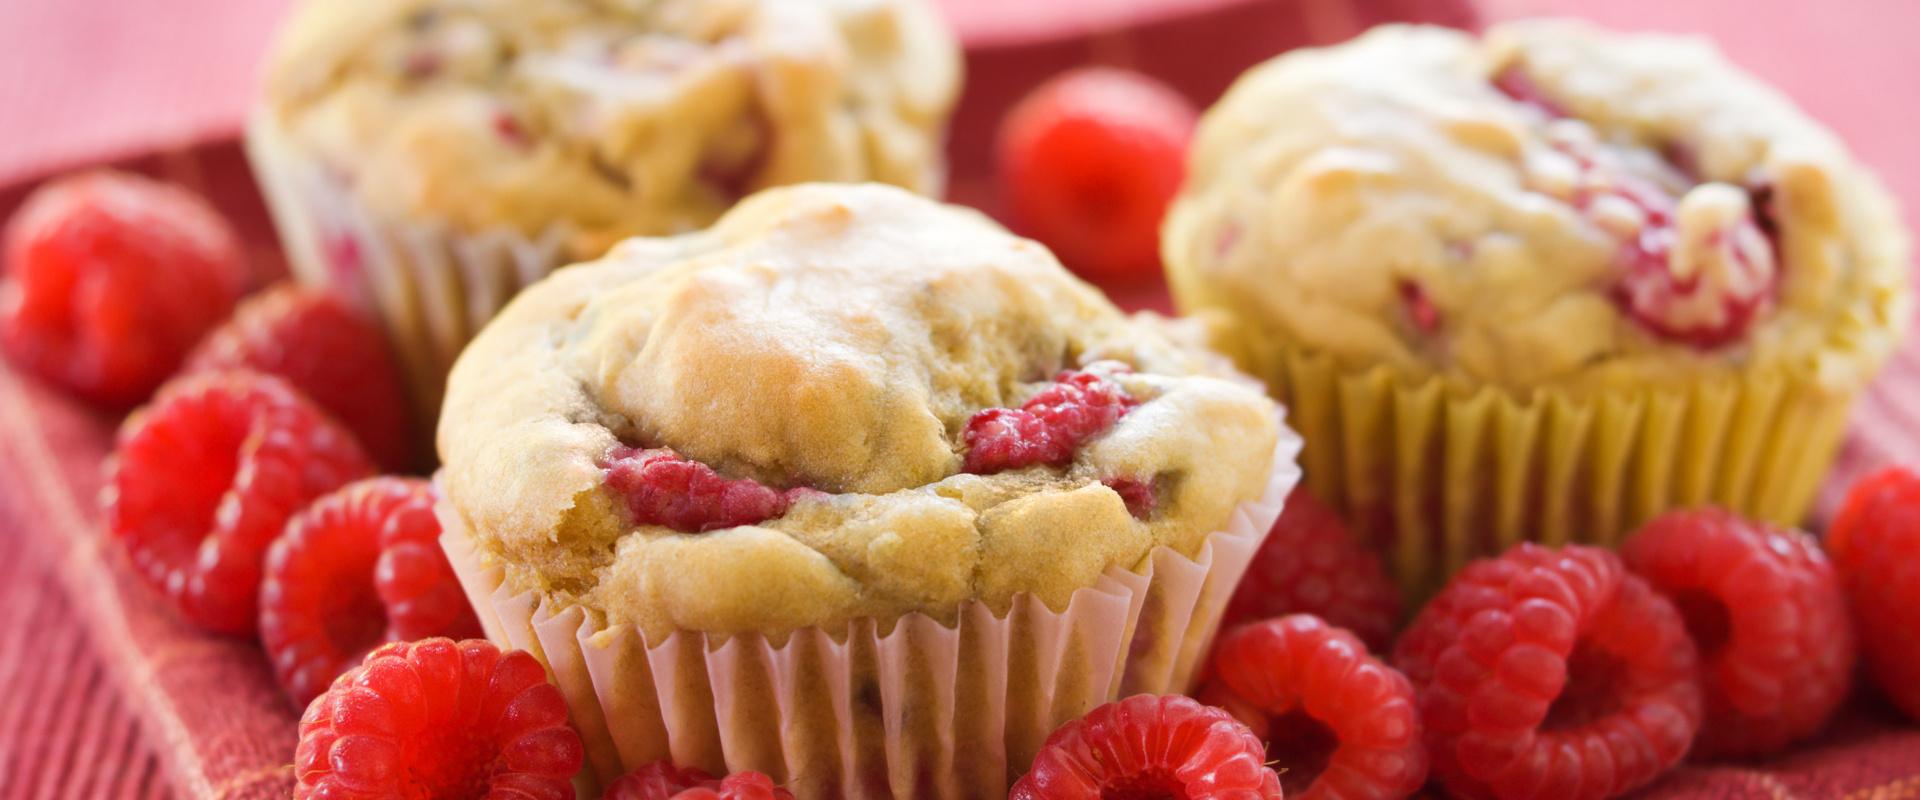 joghurtos málnás muffin cover